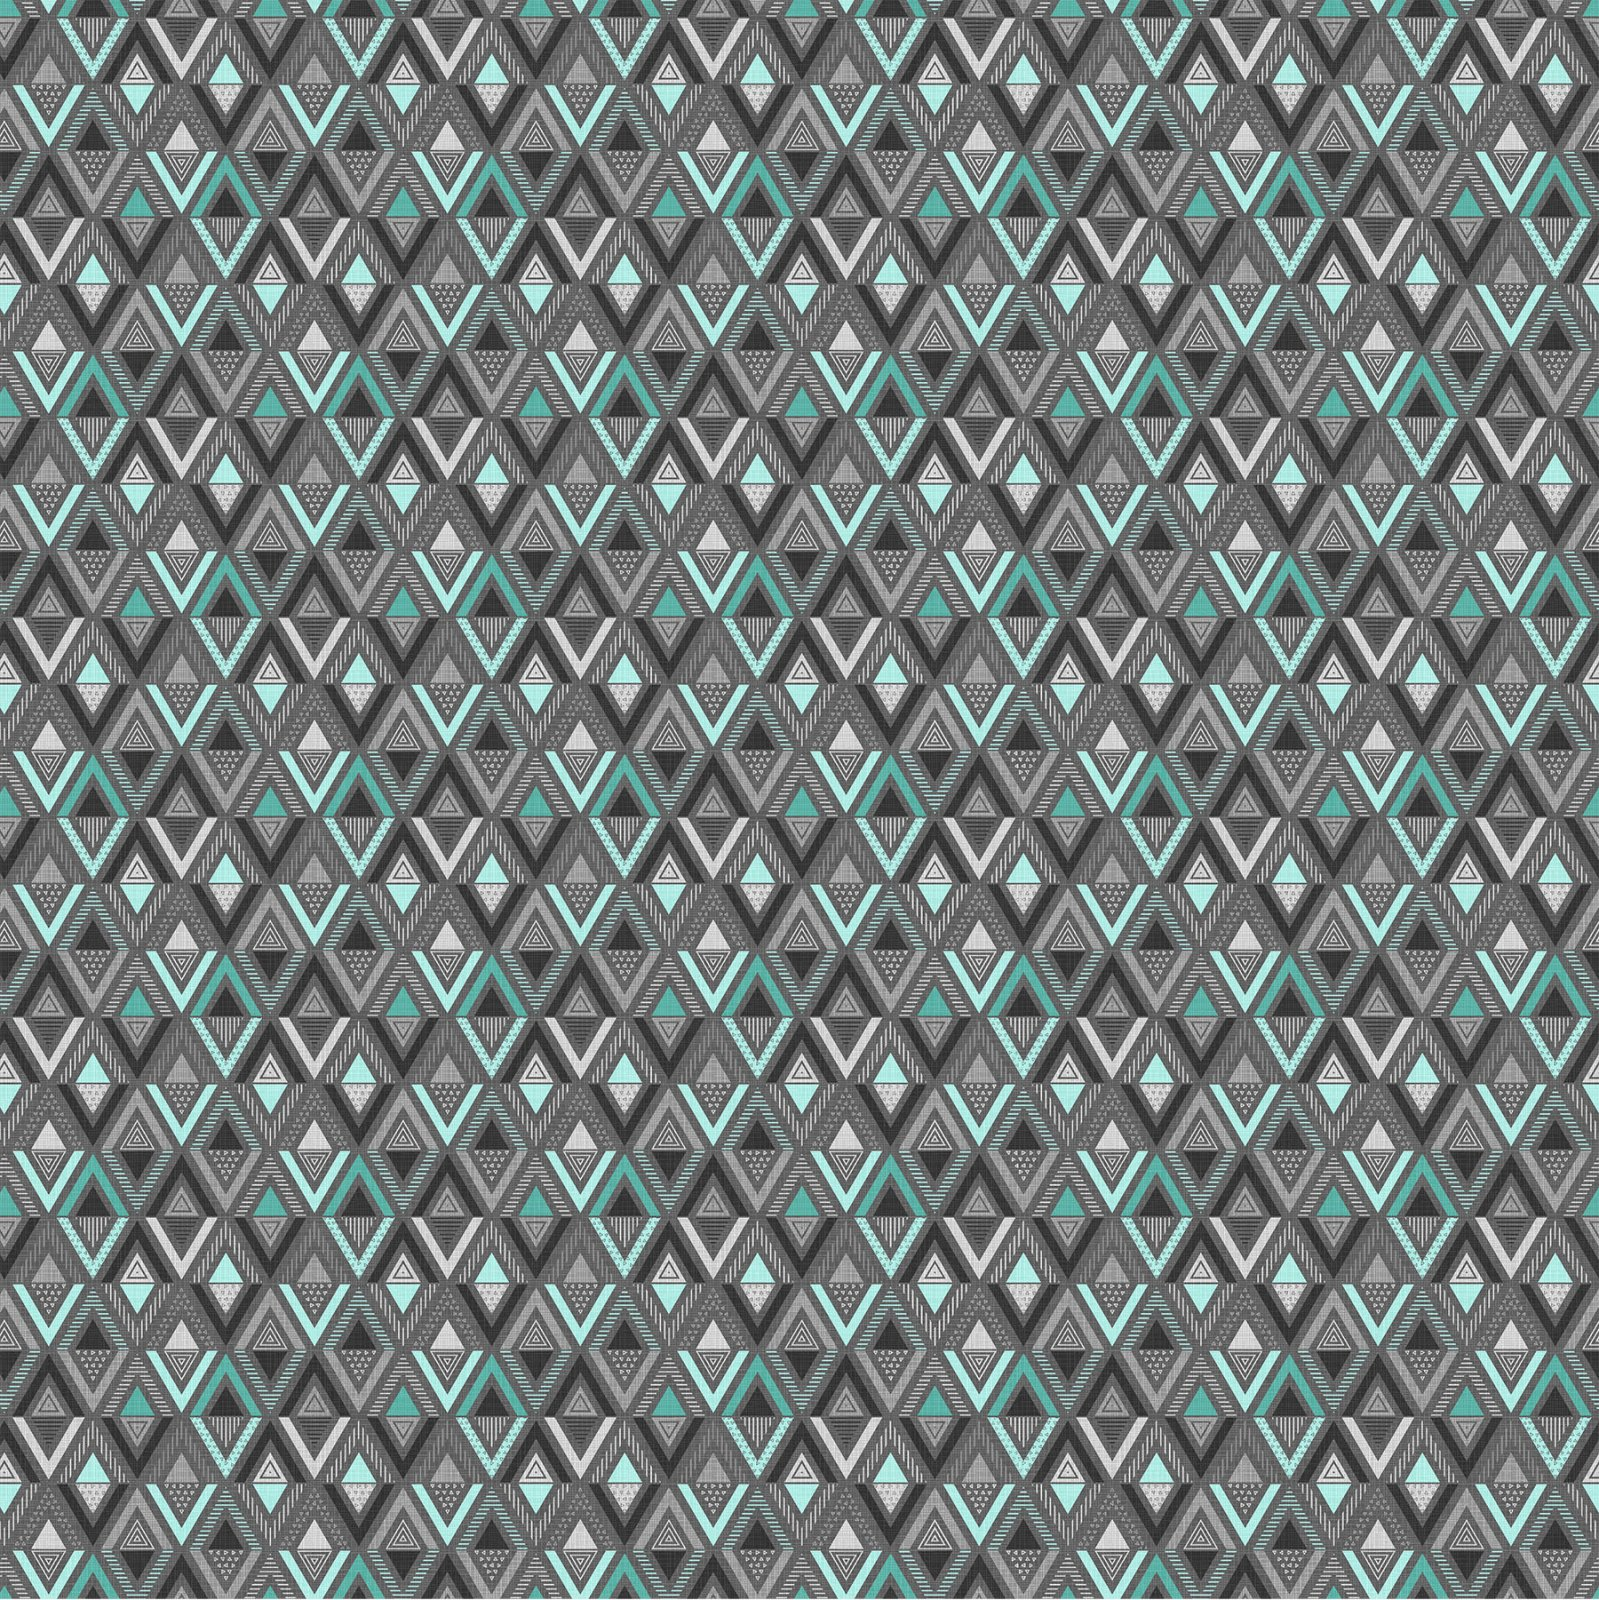 Cosmo Oxygen - Triangle Diamond